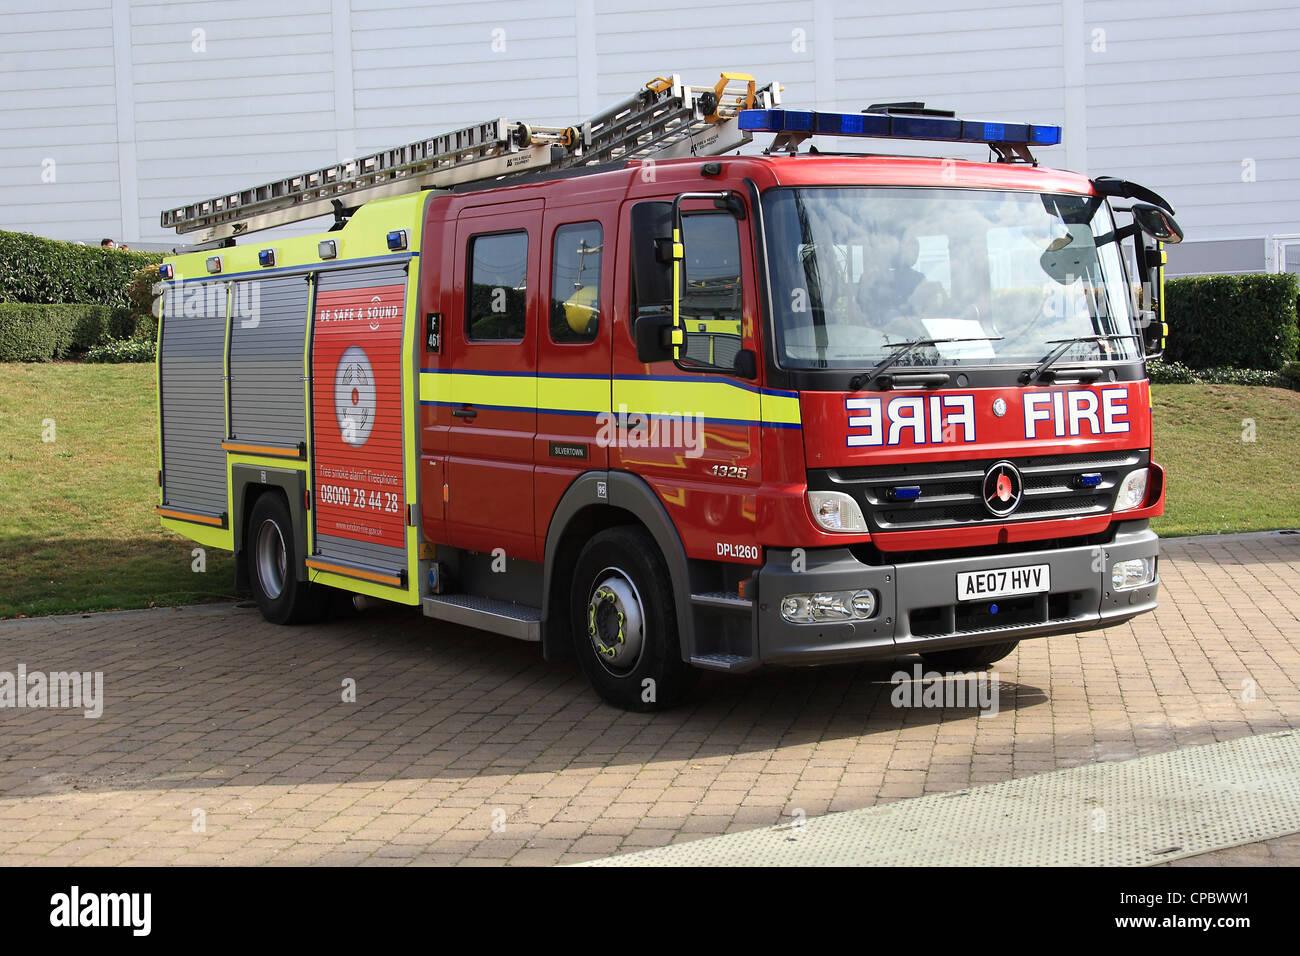 London Fire Brigade Mercedes Atego fire engine - Stock Image